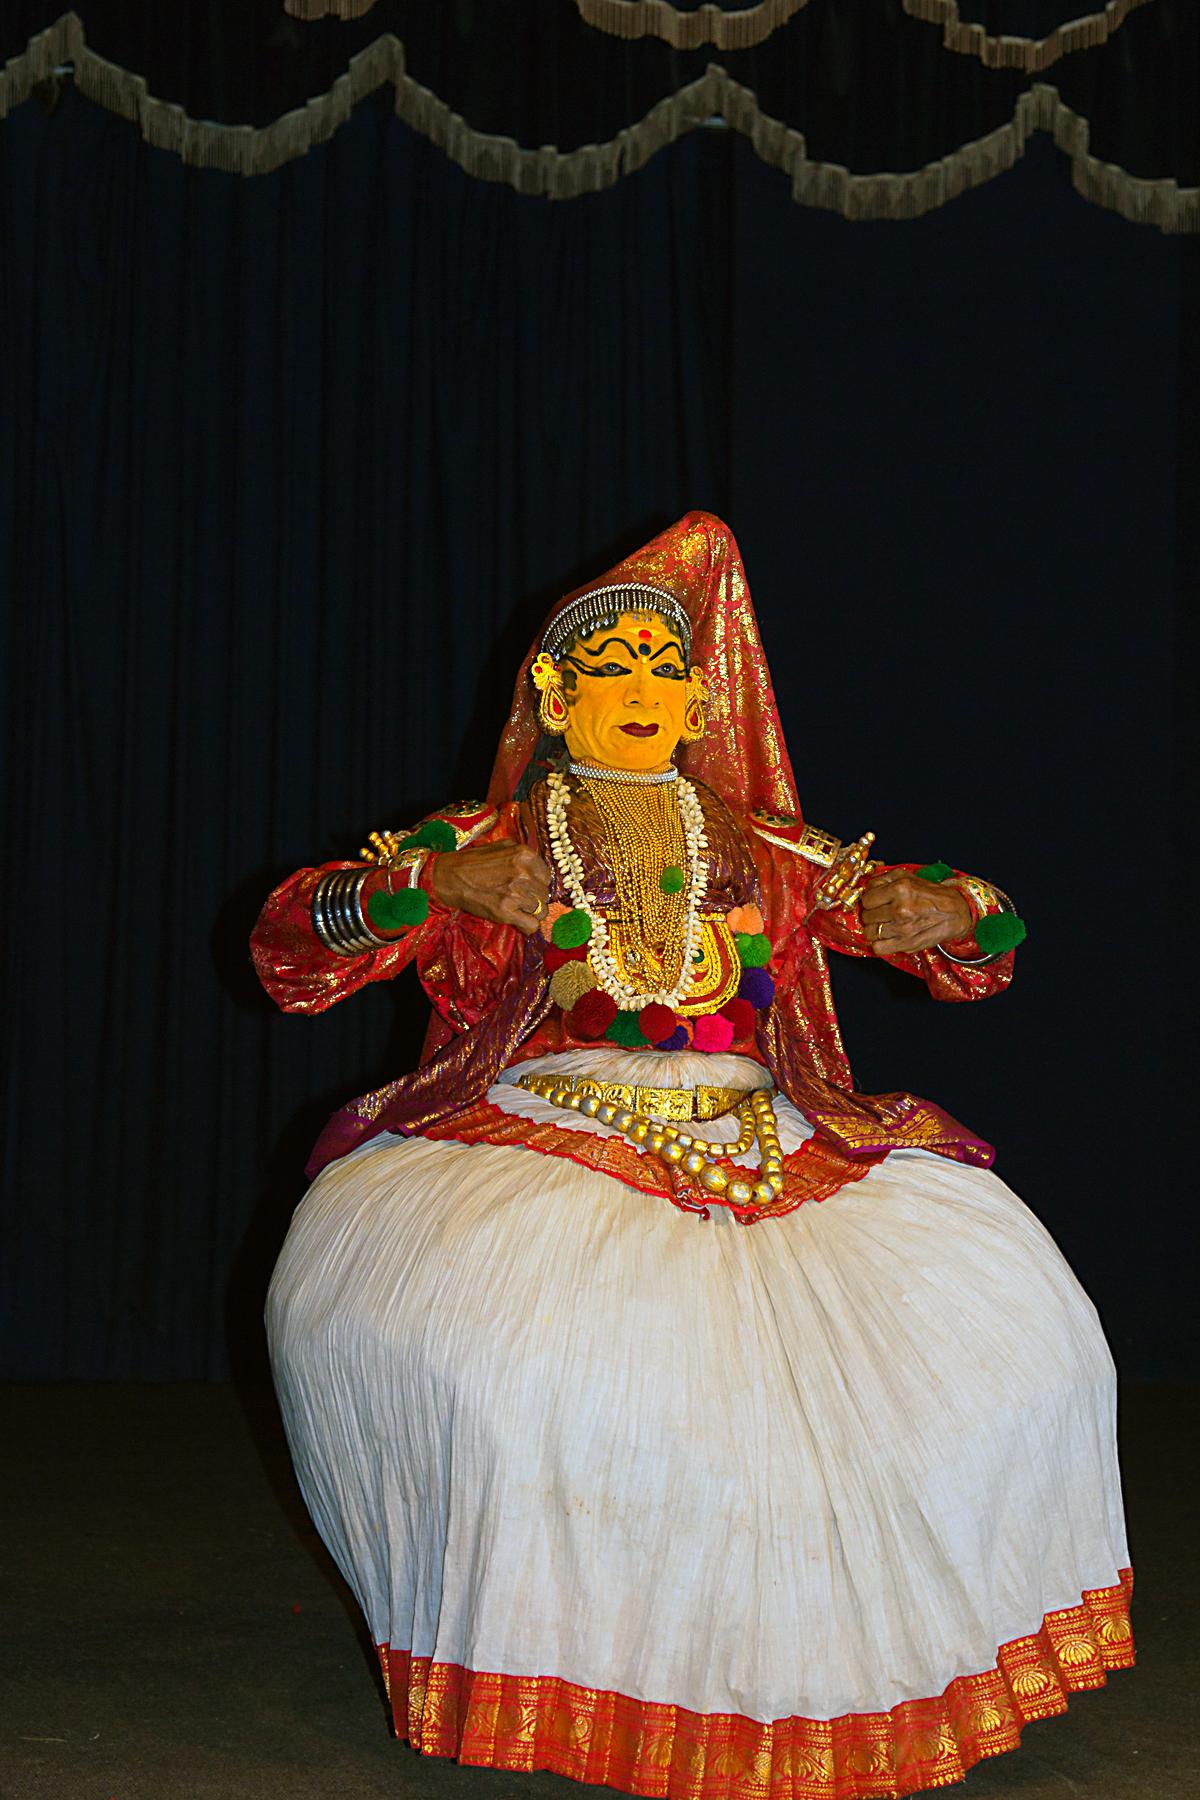 INDIEN Cochin Kerala Menschen Masken FINEST-onTour 9025.jpg